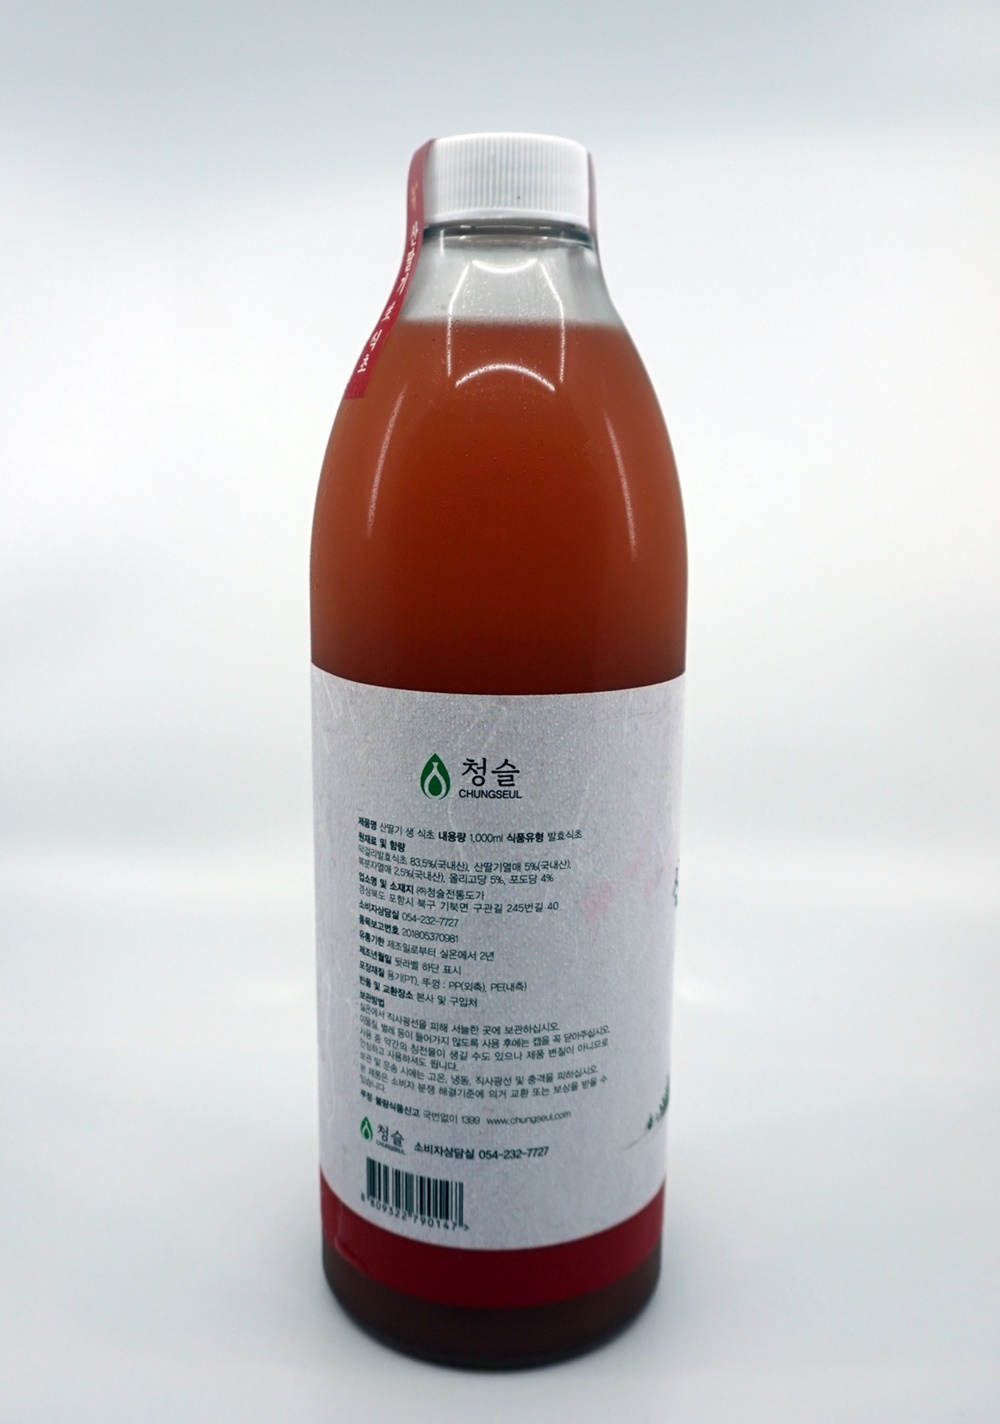 DSC05447-1.JPG